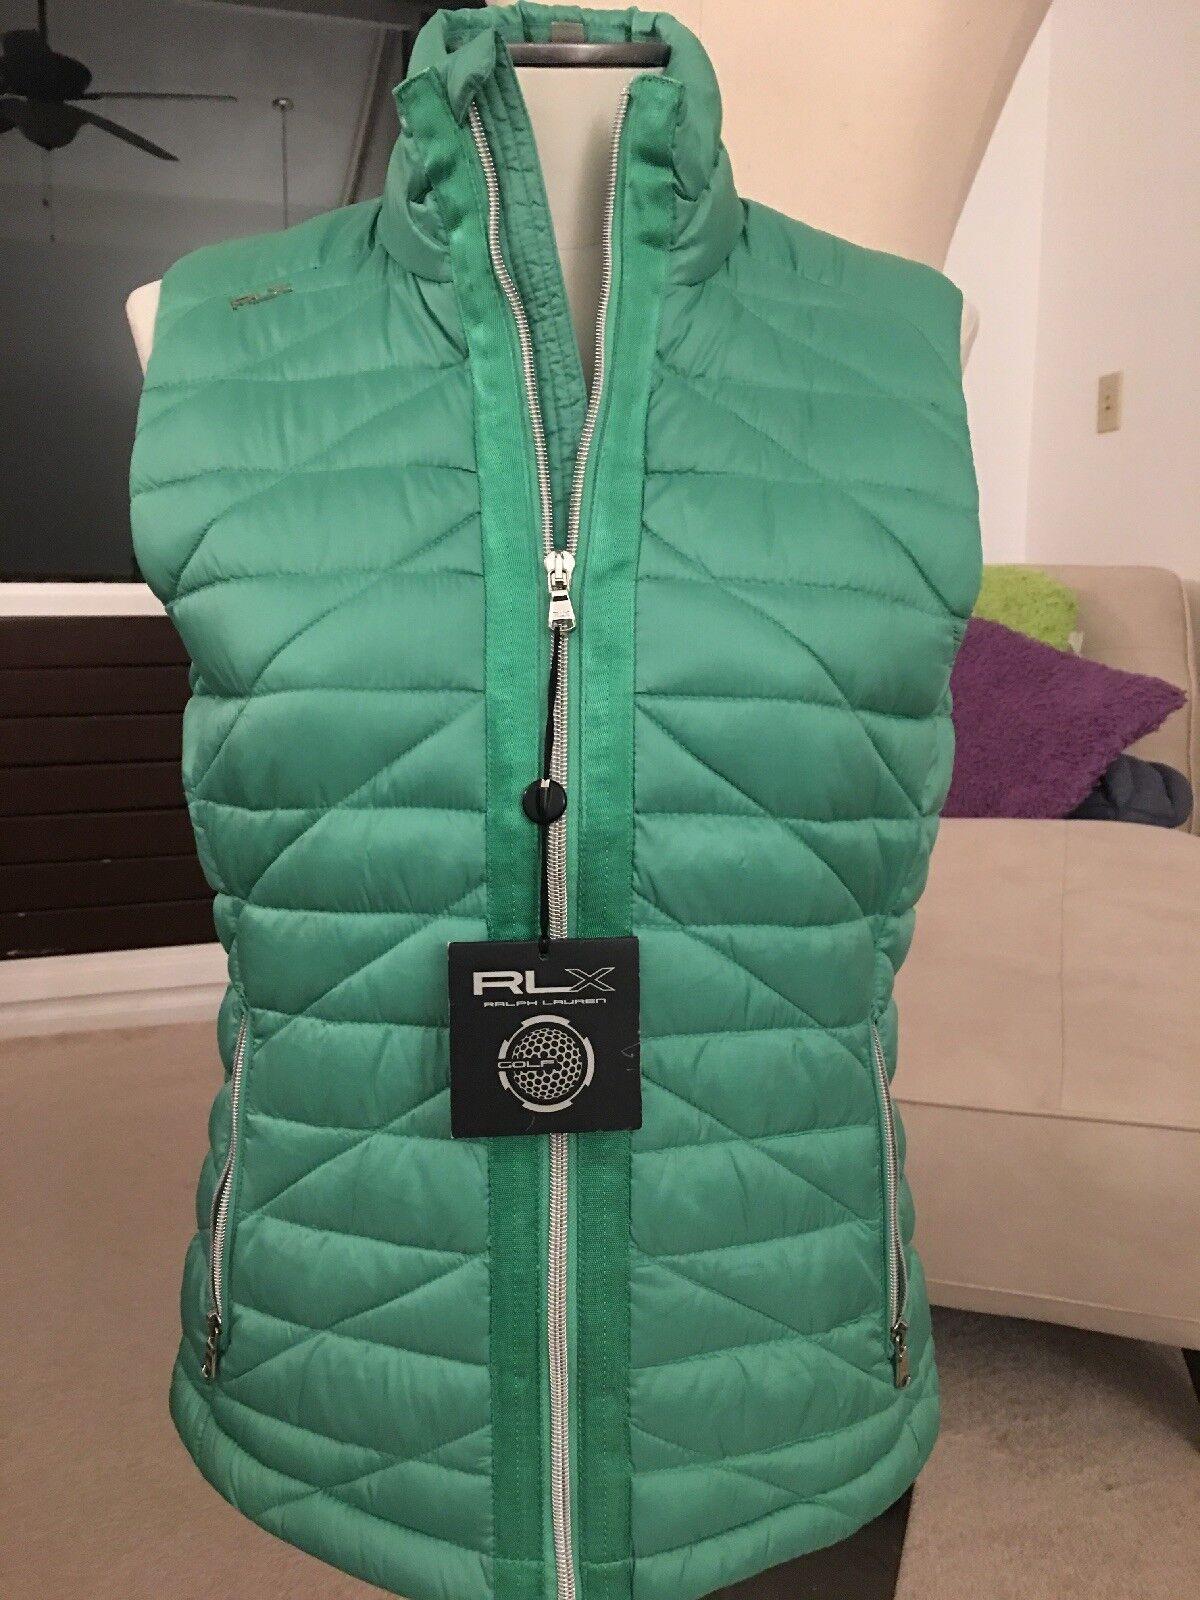 Ralph lauren womens vest small Polo RLX